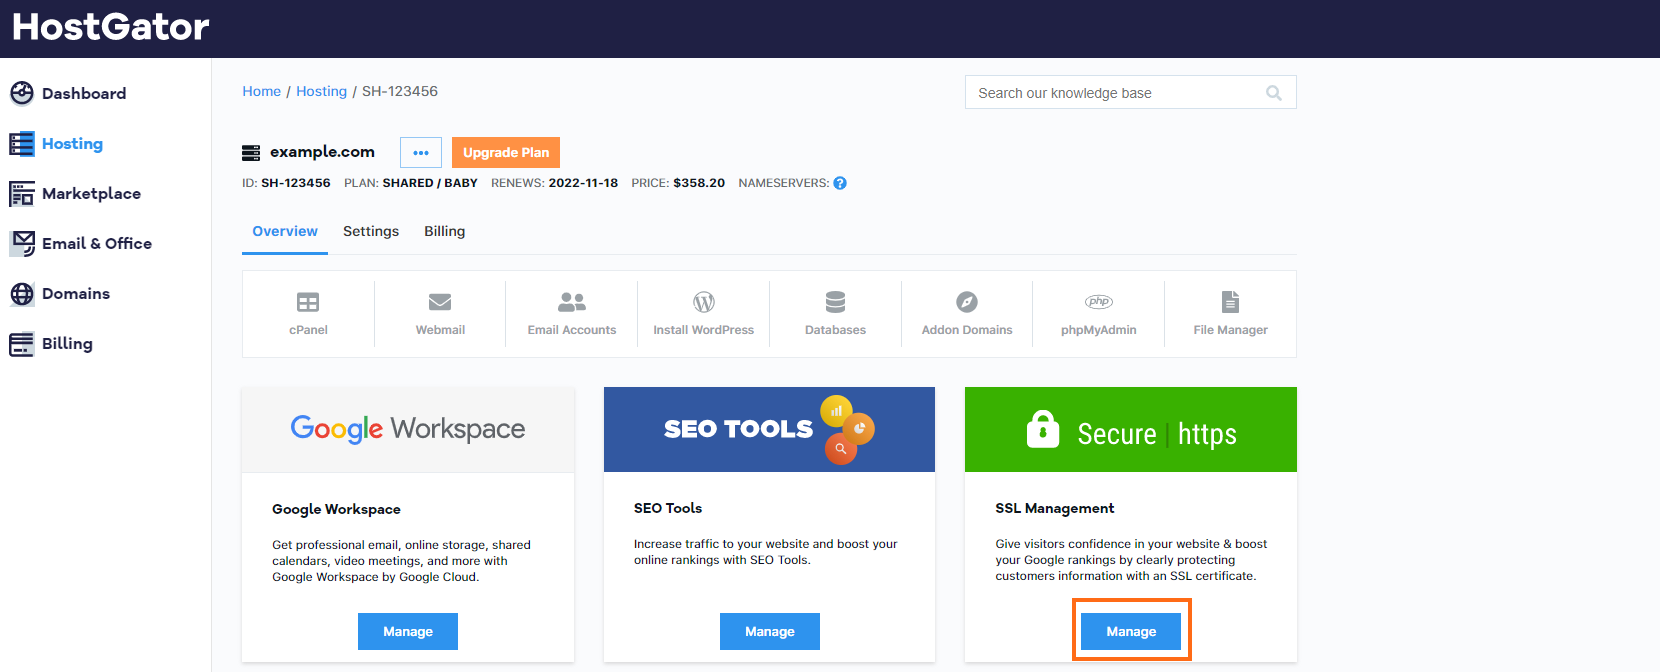 HostGator Free SSL | HostGator Support